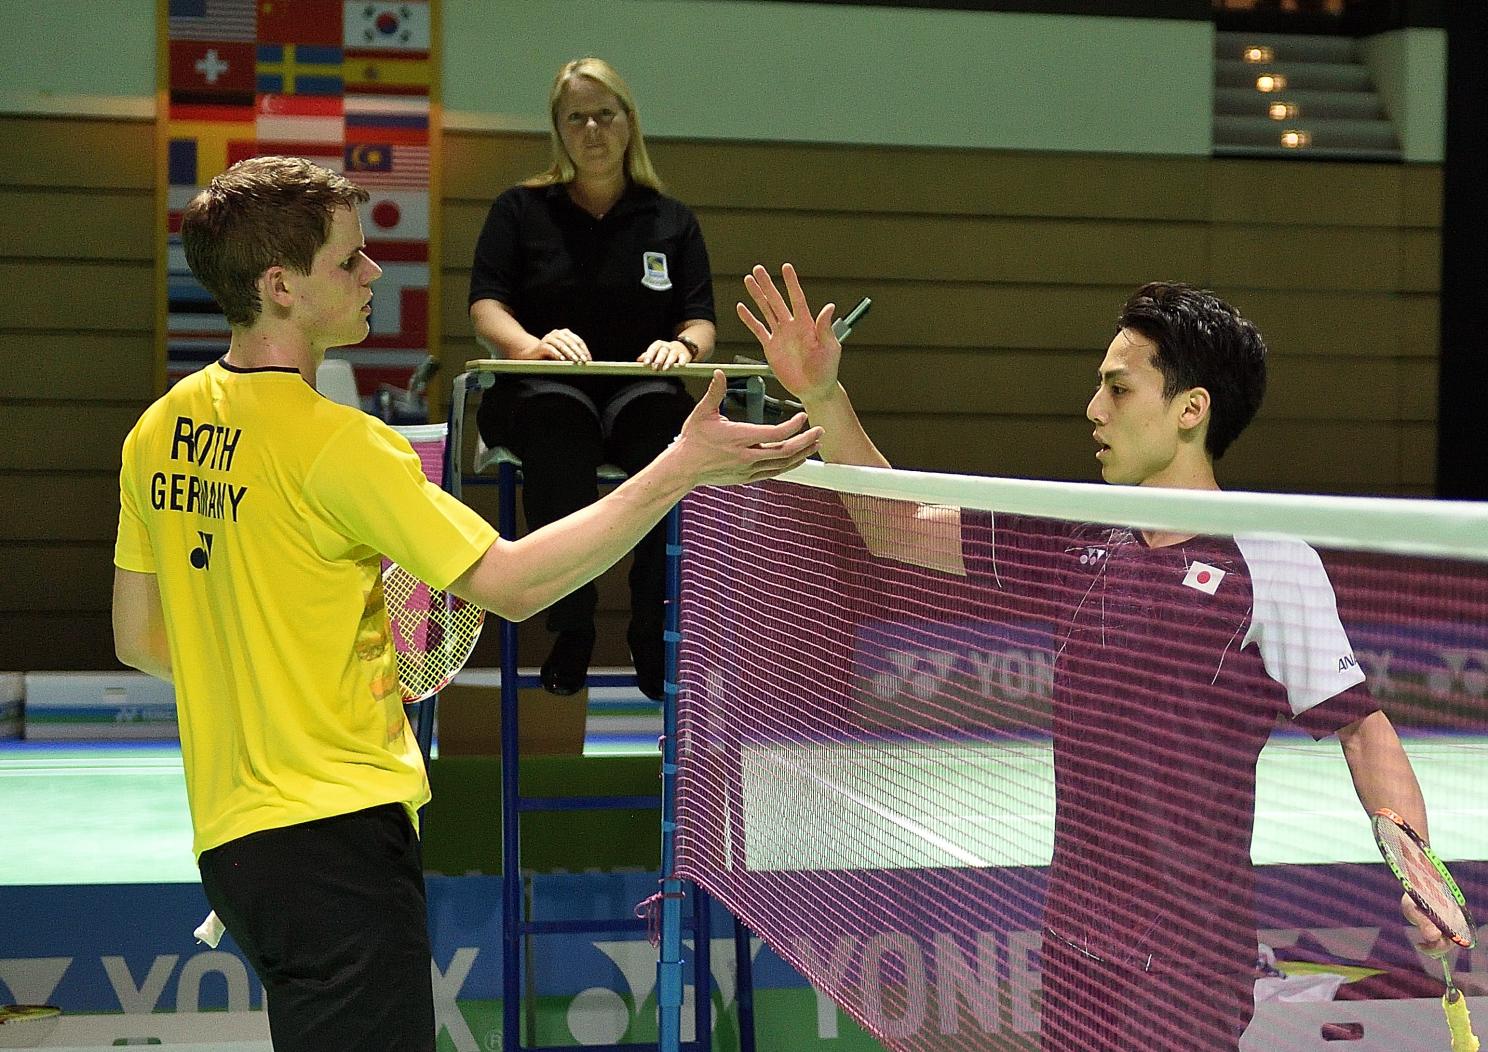 Knapp ausgeschieden ist dagegen leider Fabian Roth. Nach gewonnenem ersten Satz hieß es am Ende 21:10 19:21 16:21 gegen den Japaner Takuma Ueda